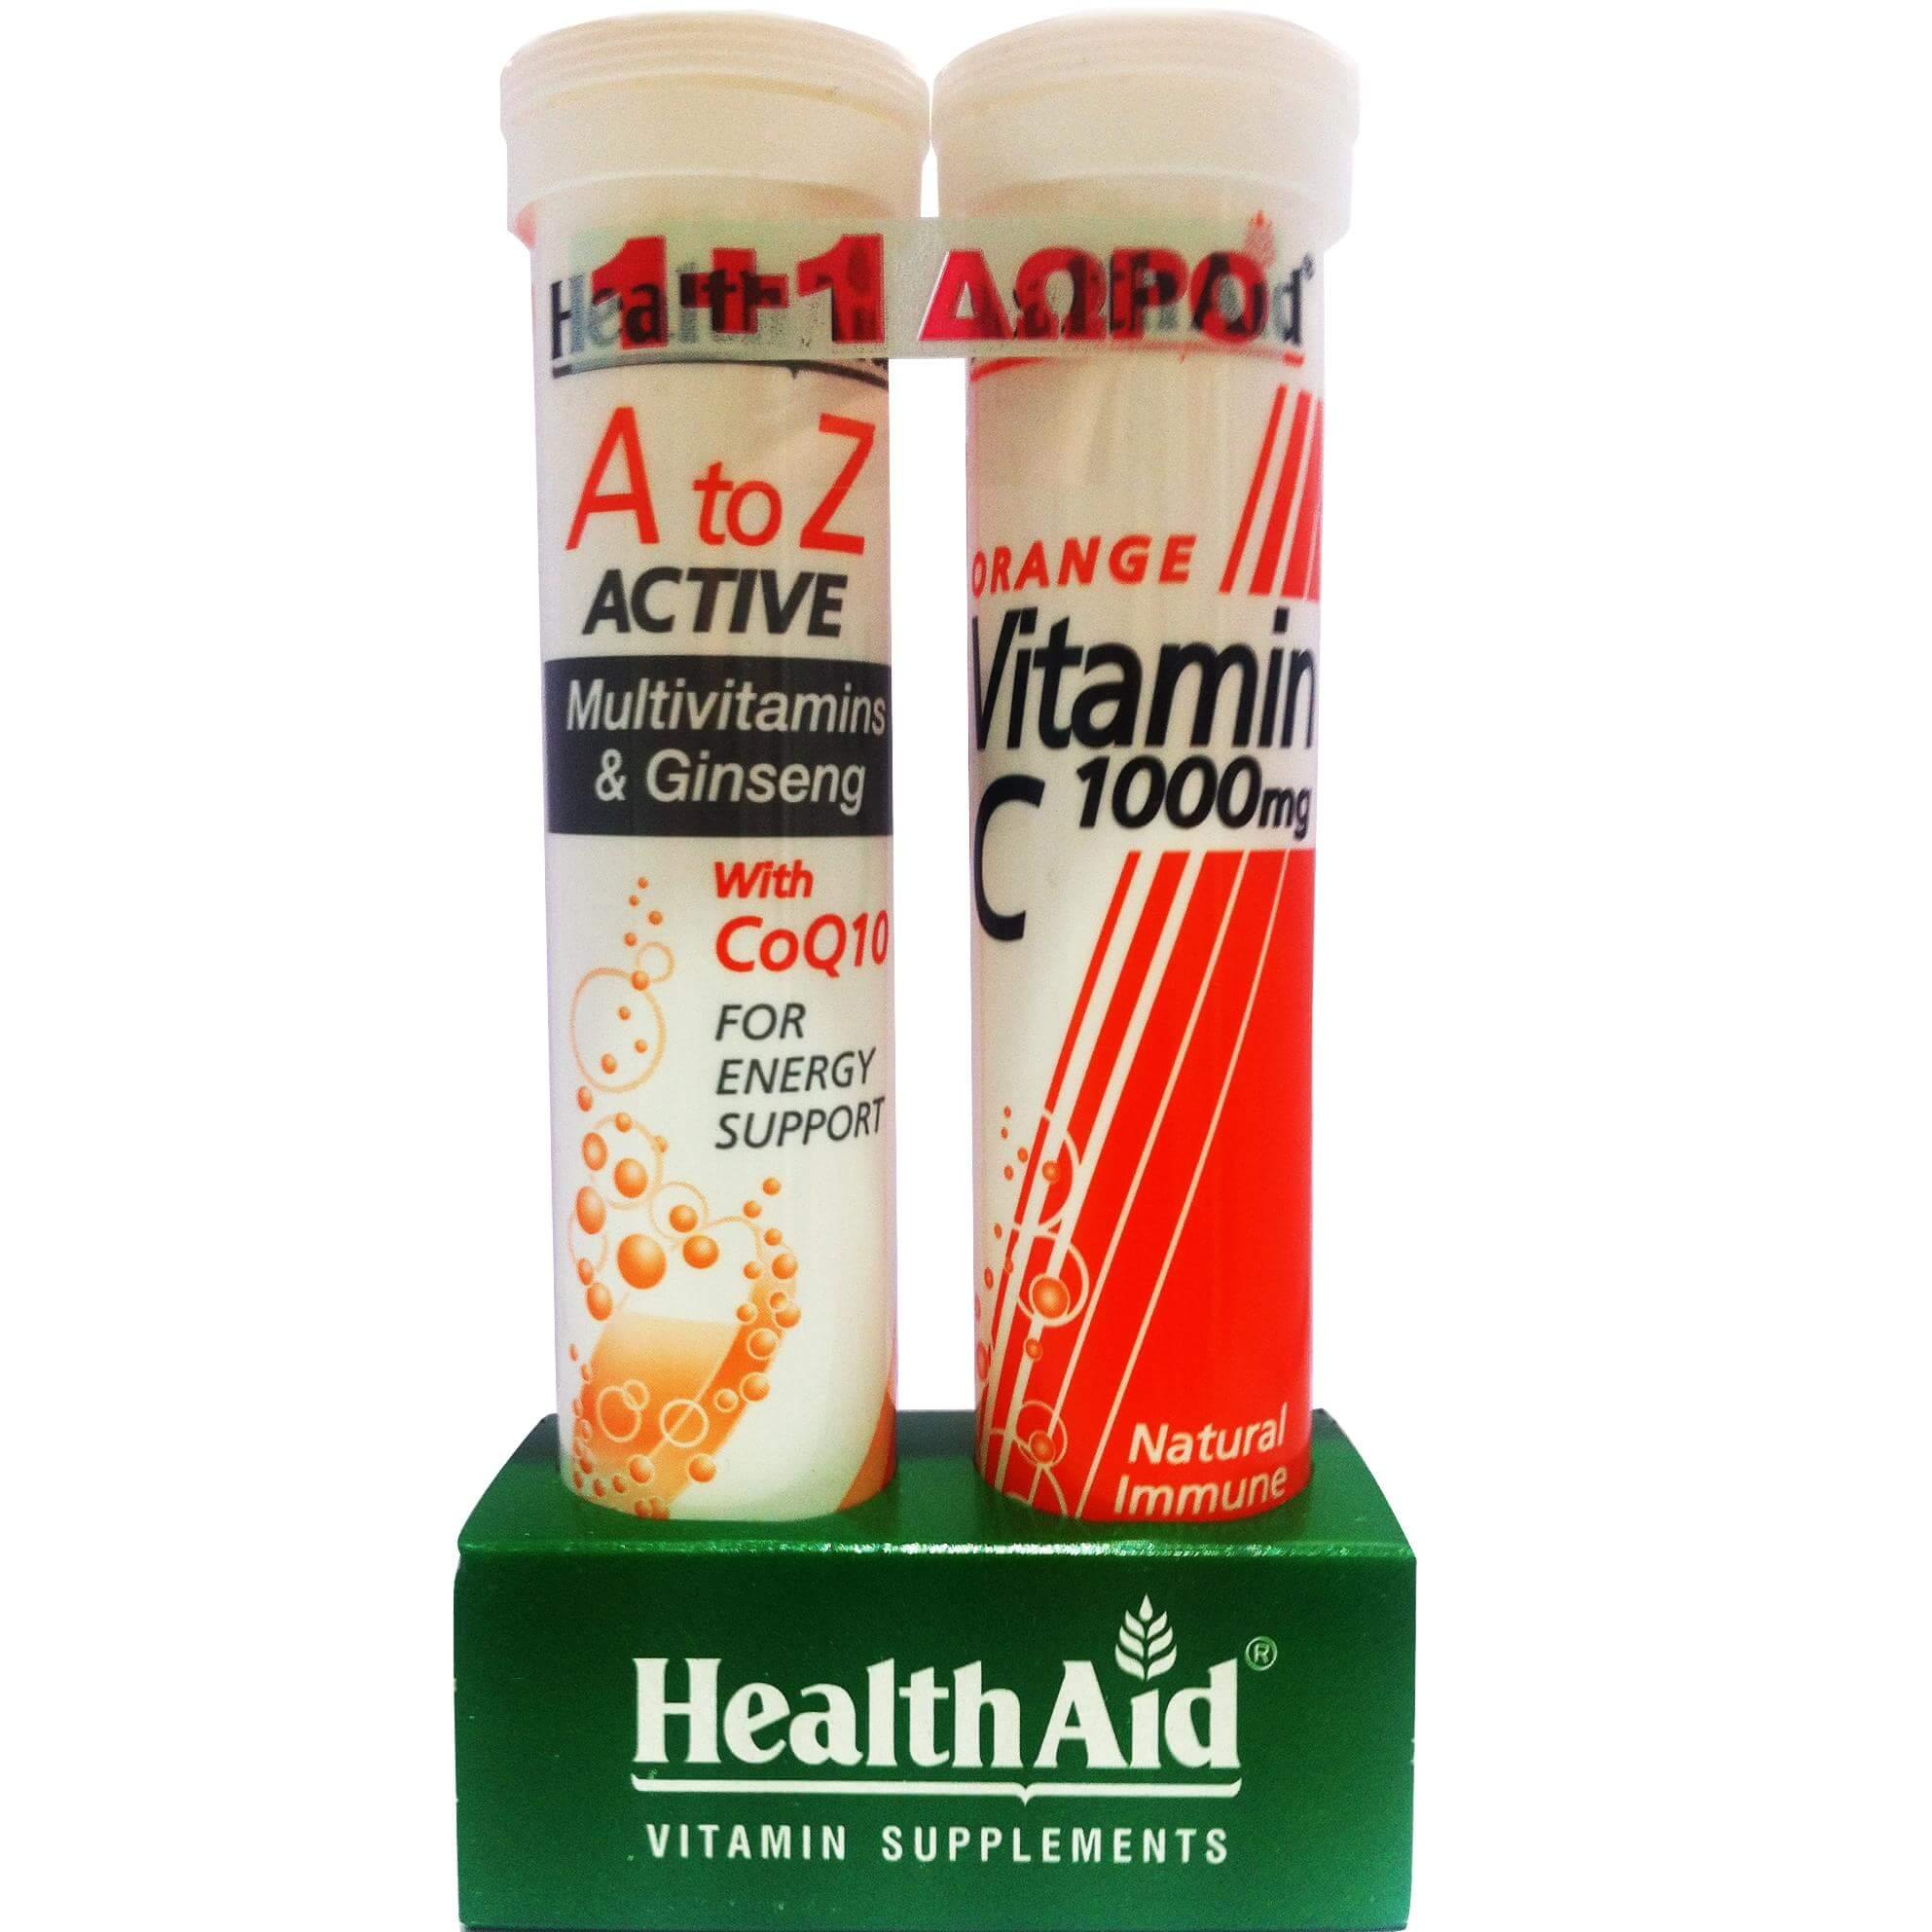 Health Aid Πακέτo Προσφοράς Α to Ζ Πολυβιταμίνες Τζίνσενγκ & Q10 20Effer.Tabs + Δώρο Vitamin C Orange 1000mg 20Effer.Tabs